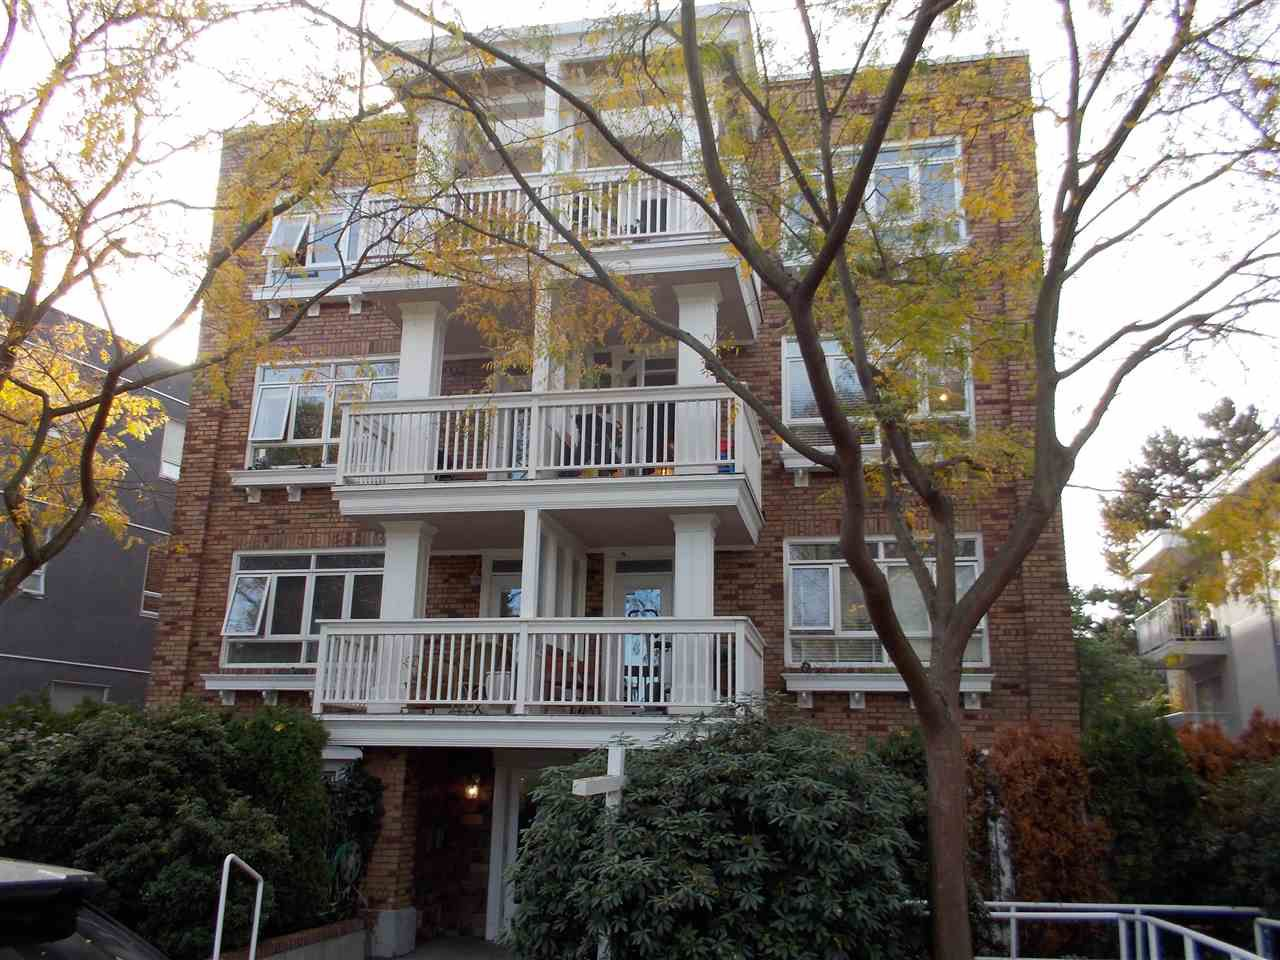 Main Photo: 104 2036 YORK AVENUE in Vancouver: Kitsilano Condo for sale (Vancouver West)  : MLS®# R2030503